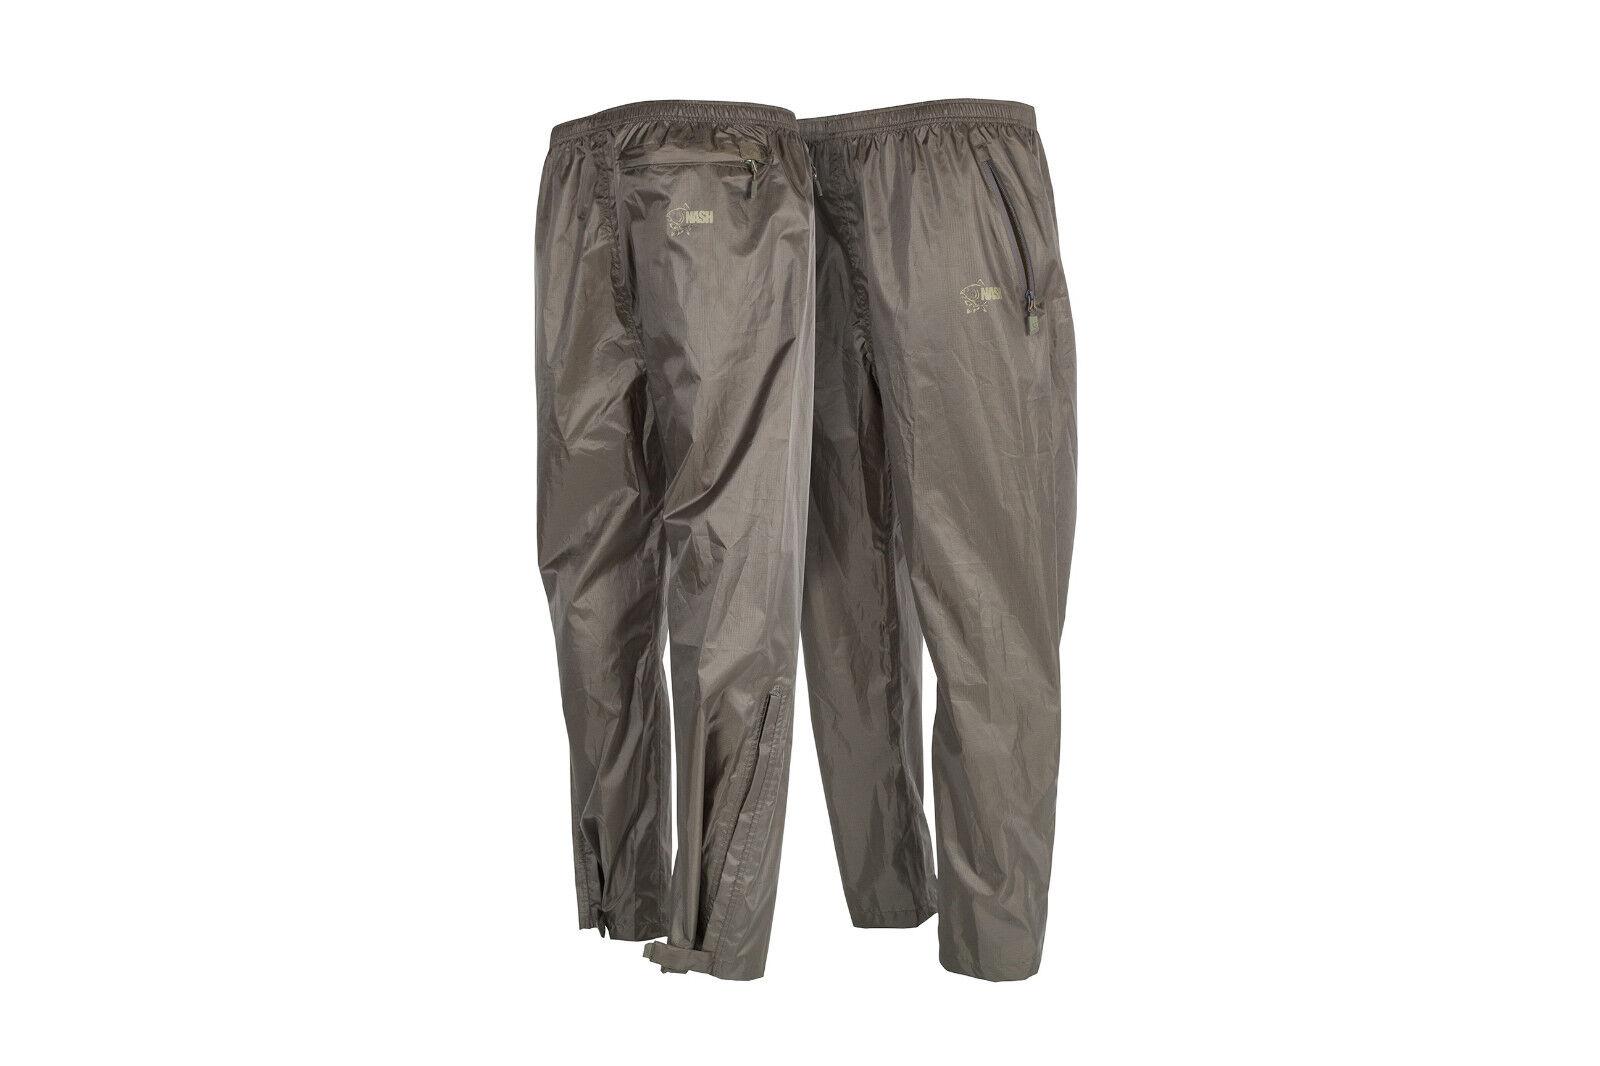 Nash Packaway Waterproof trousers pantaloni pioggia RAIN TROUSERS Pantaloni Pioggia